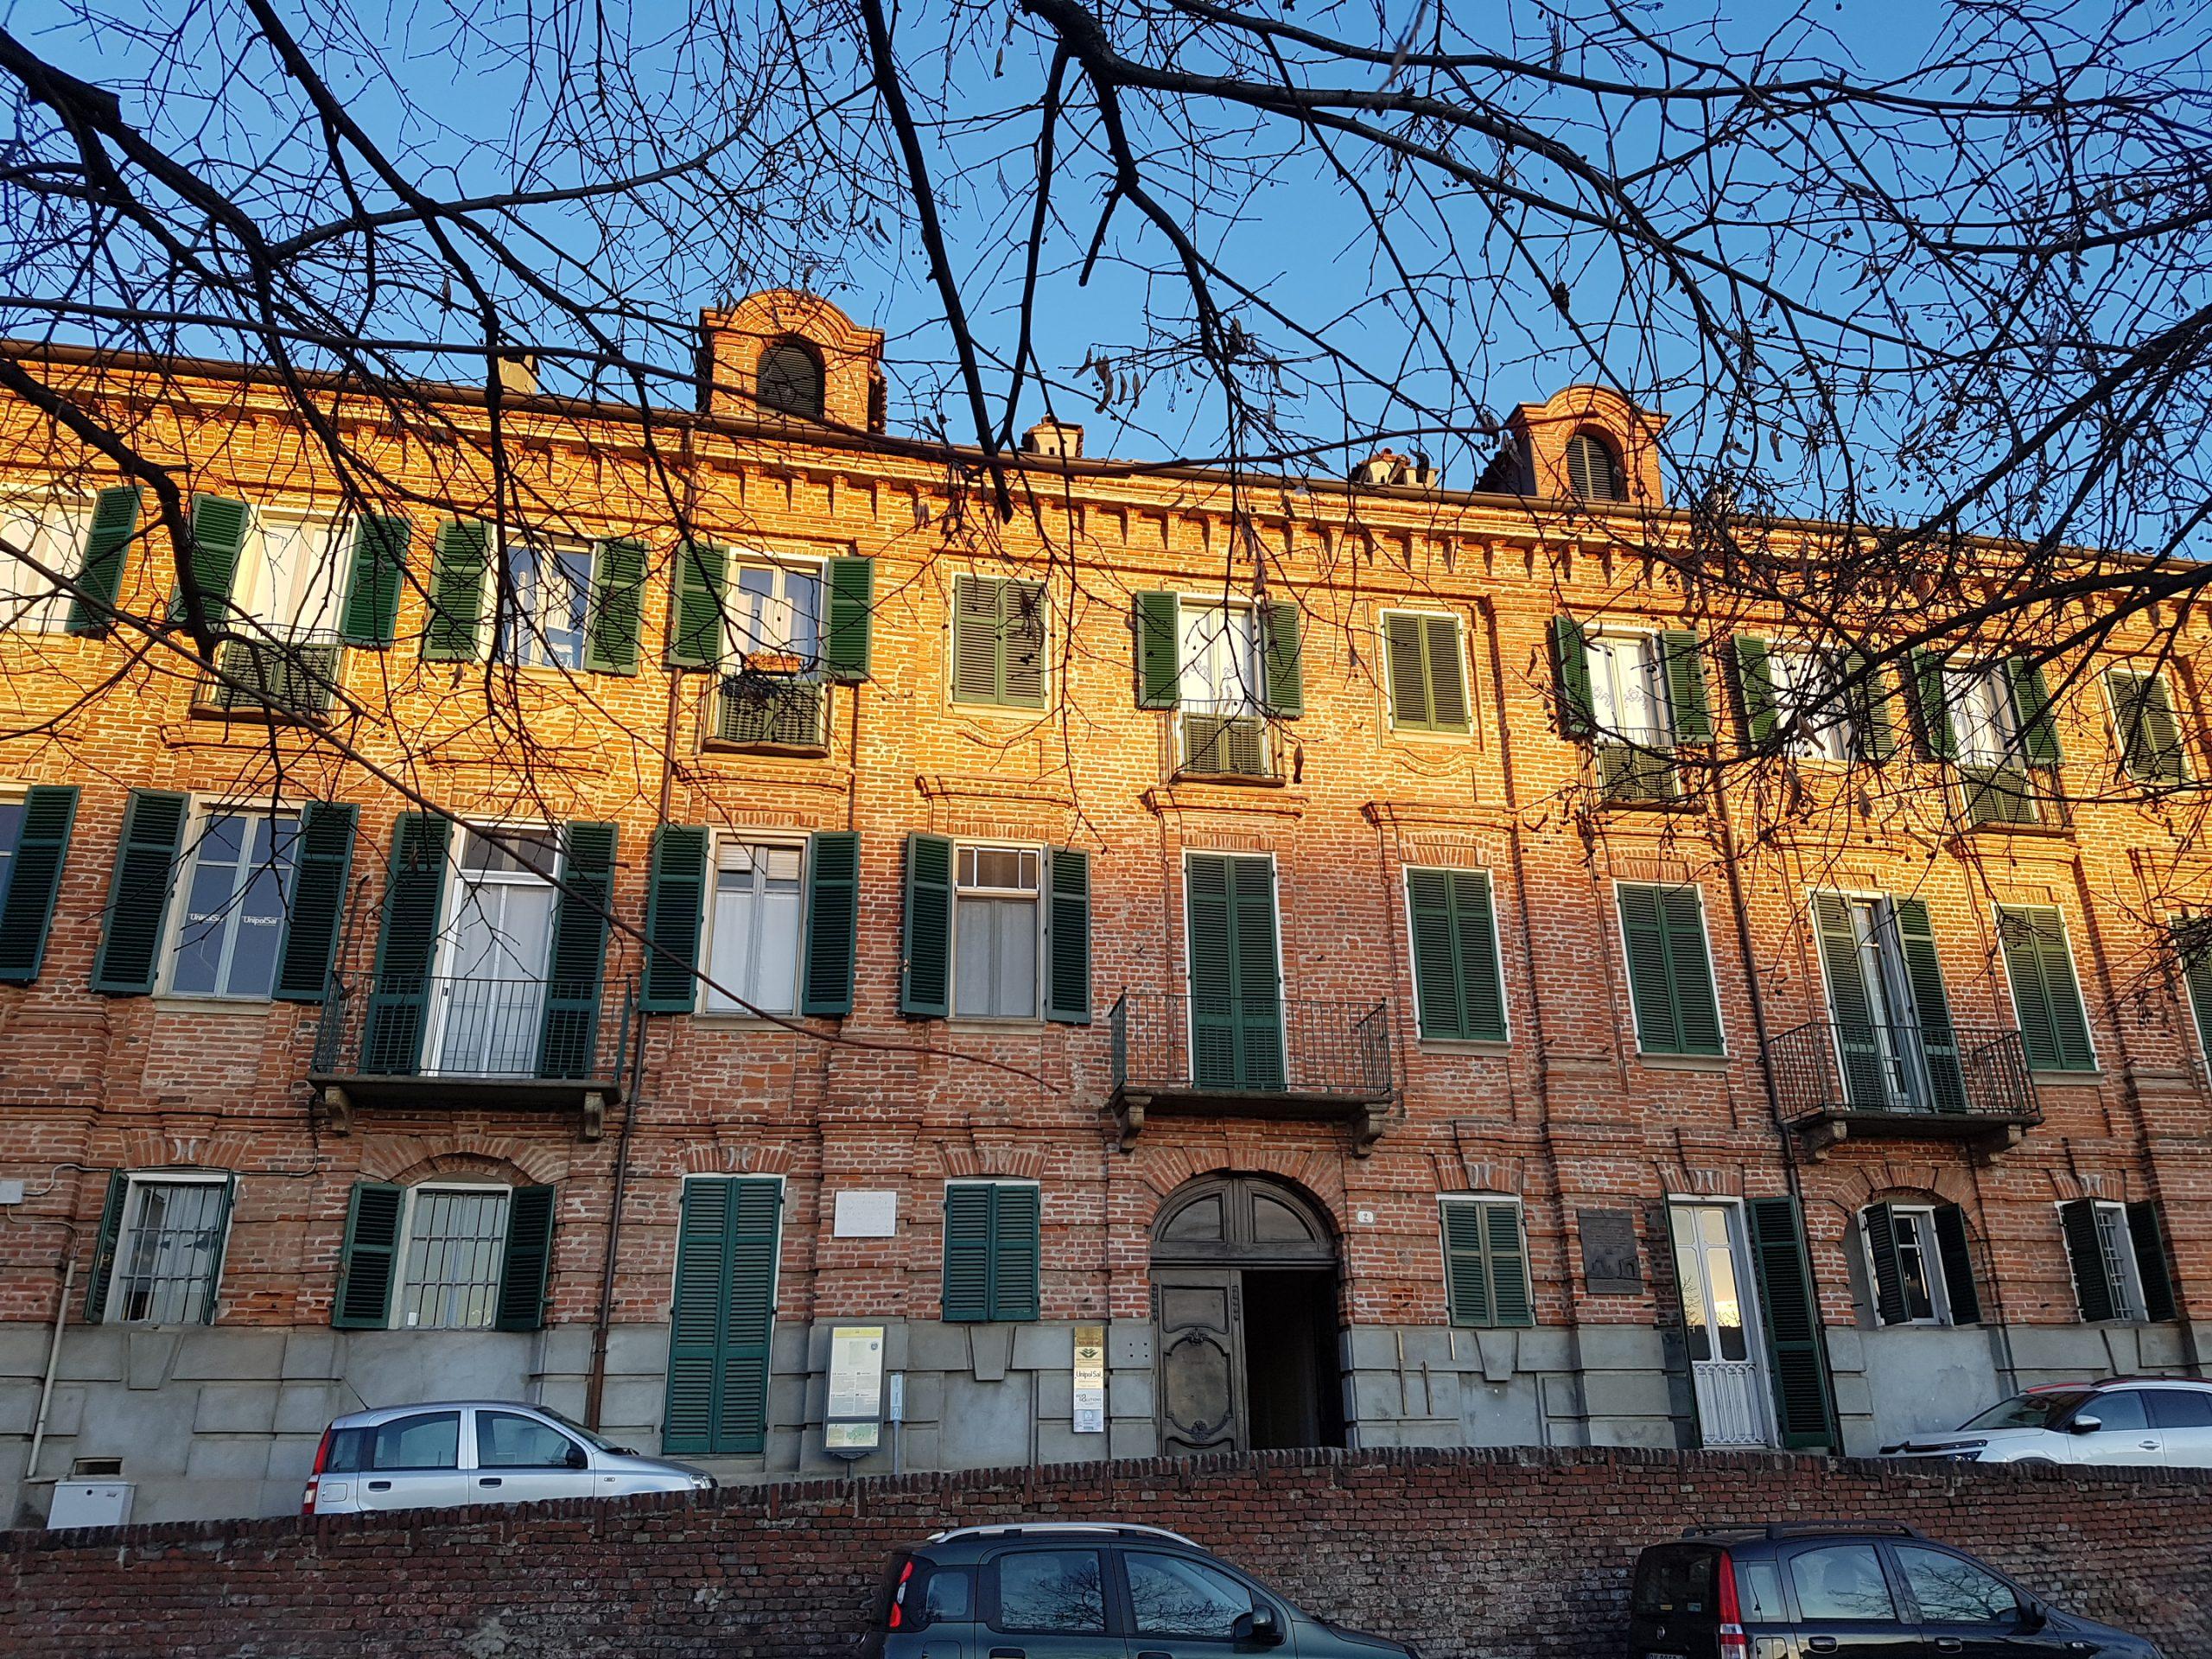 Palazzo_Tesio_Chivasso_Itali